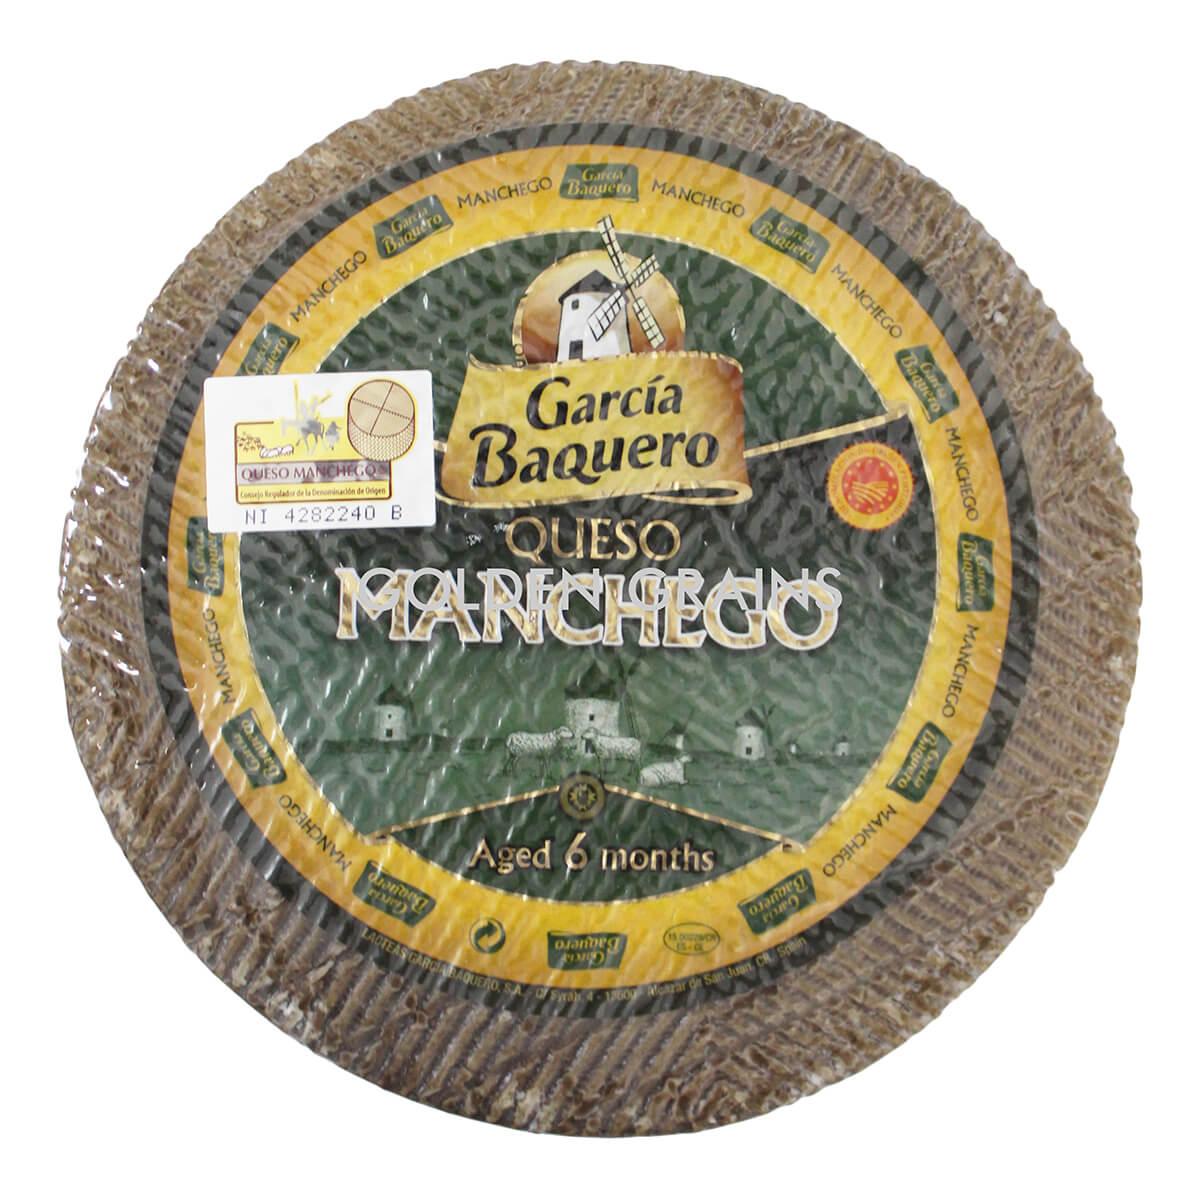 Garcia Banquero Manchego